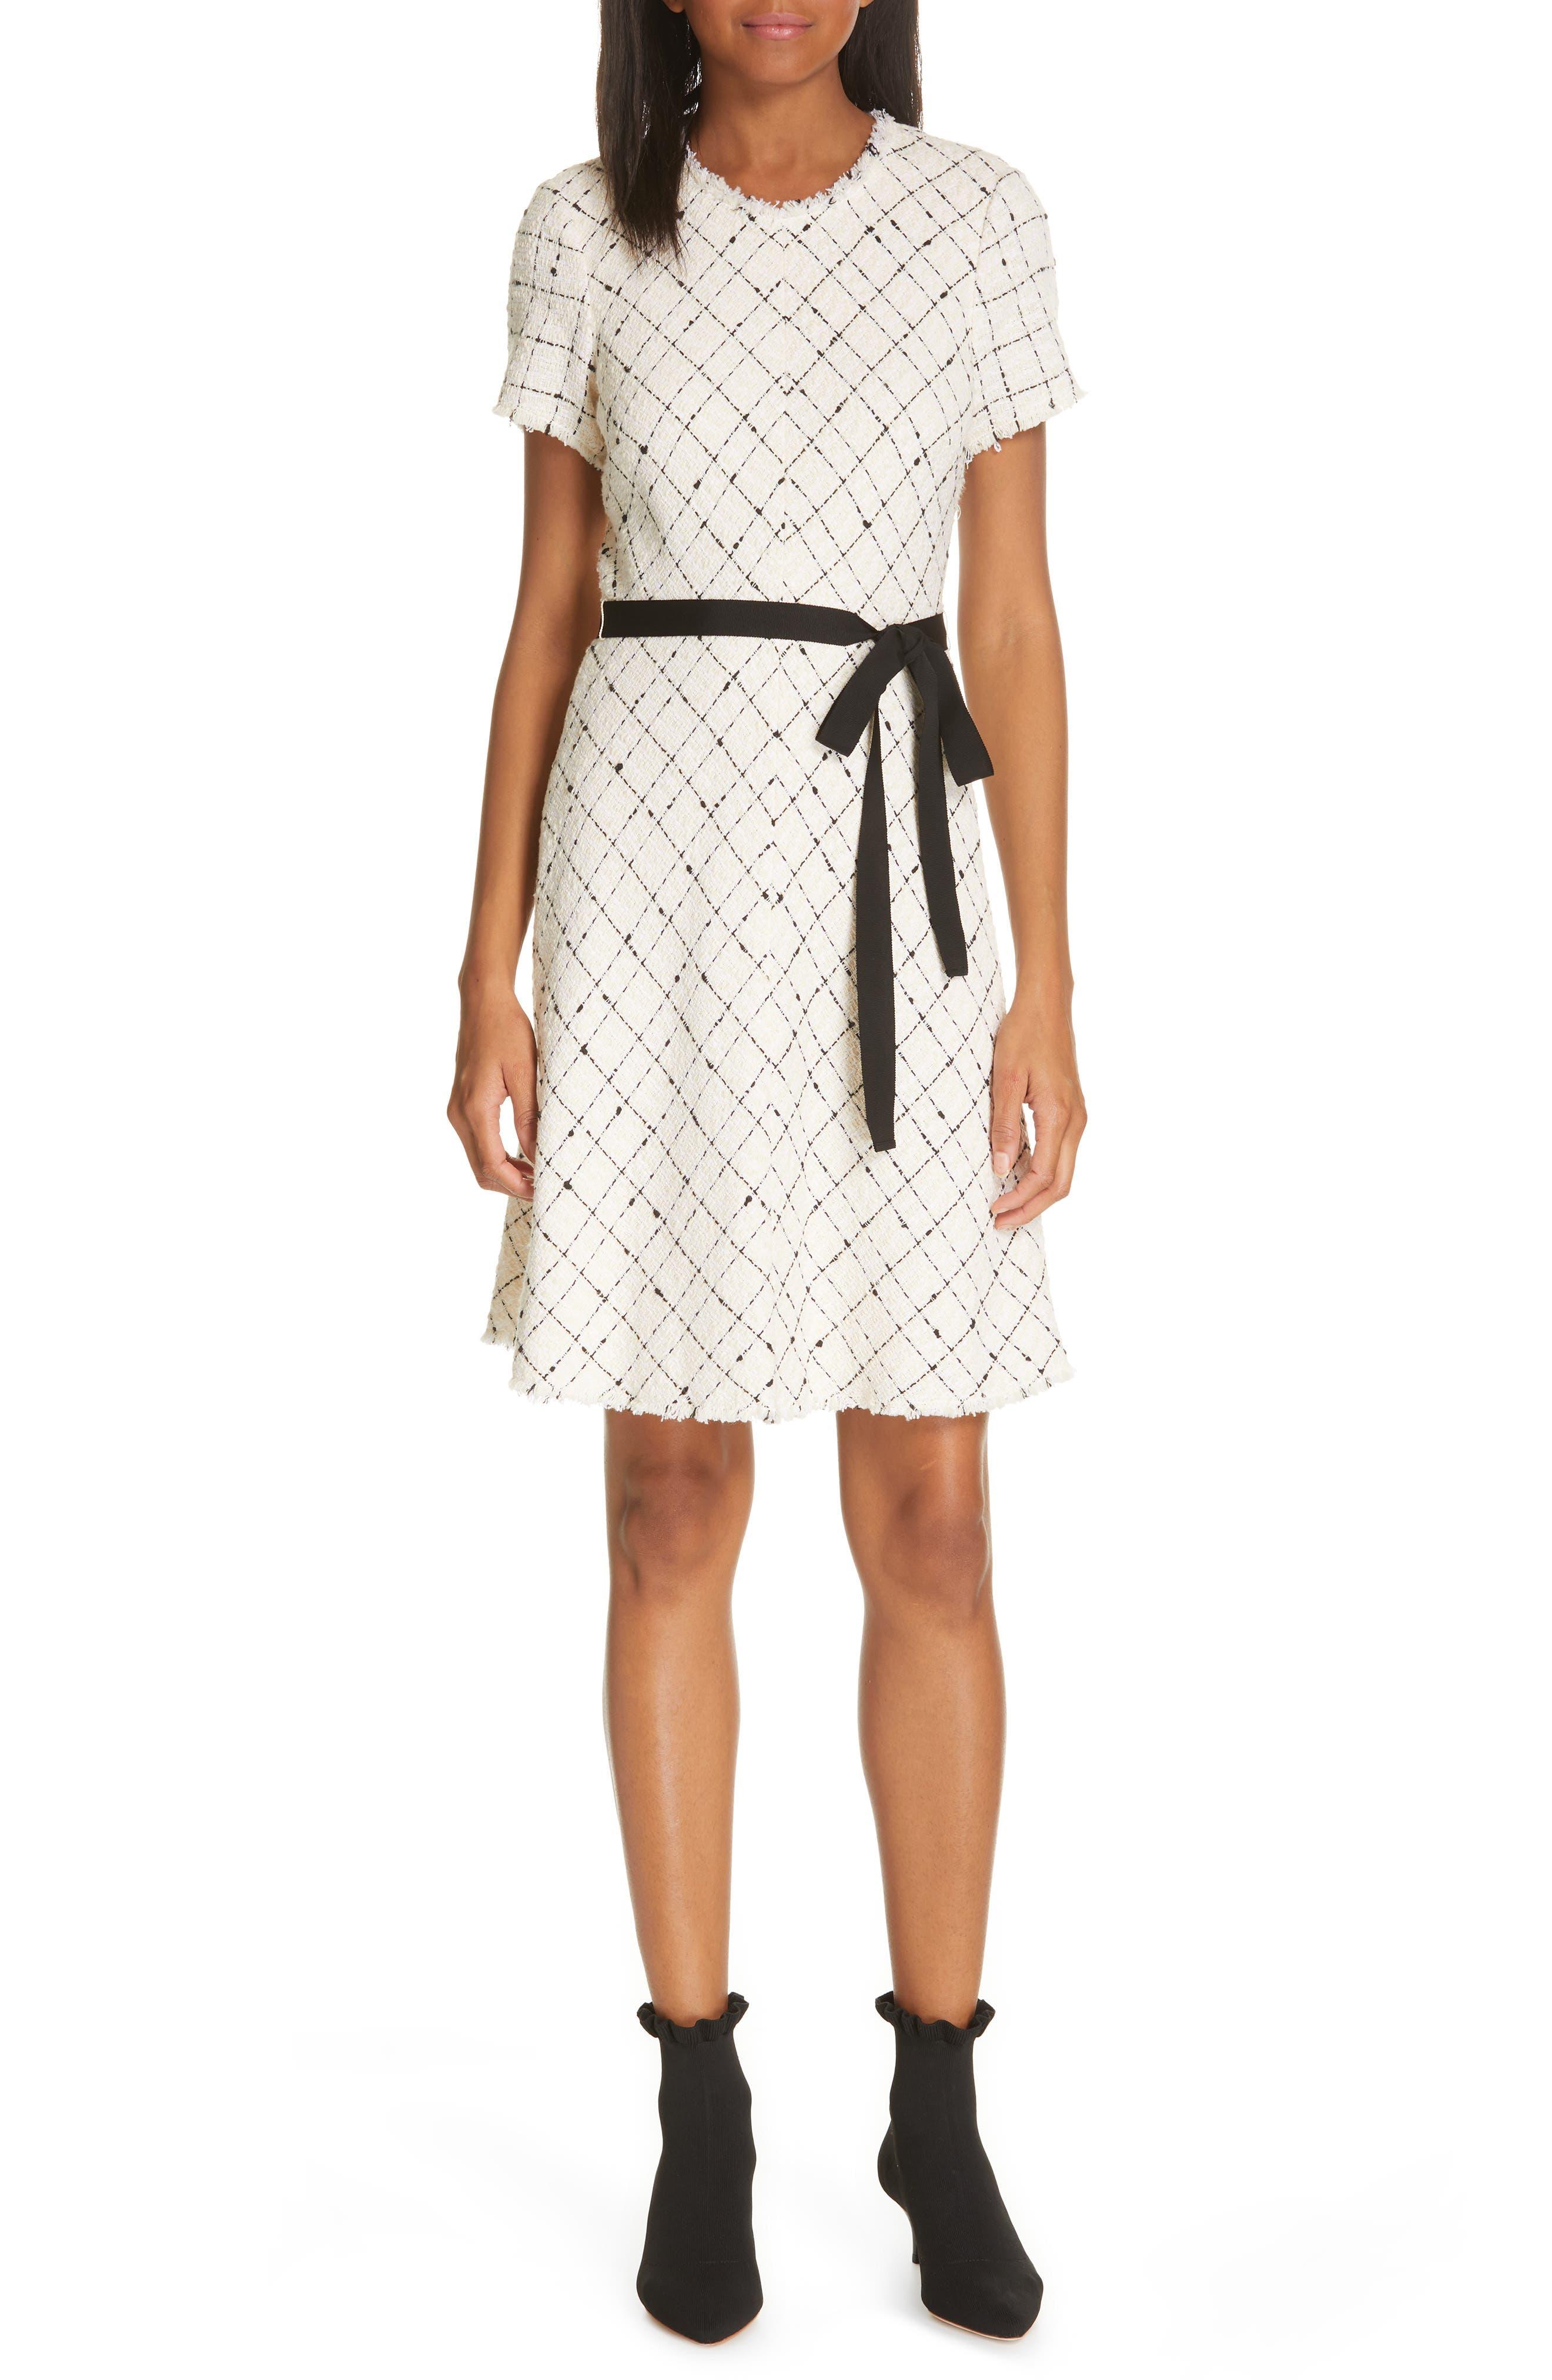 REBECCA TAYLOR, Plaid Tweed Dress, Main thumbnail 1, color, CREAM COMBO